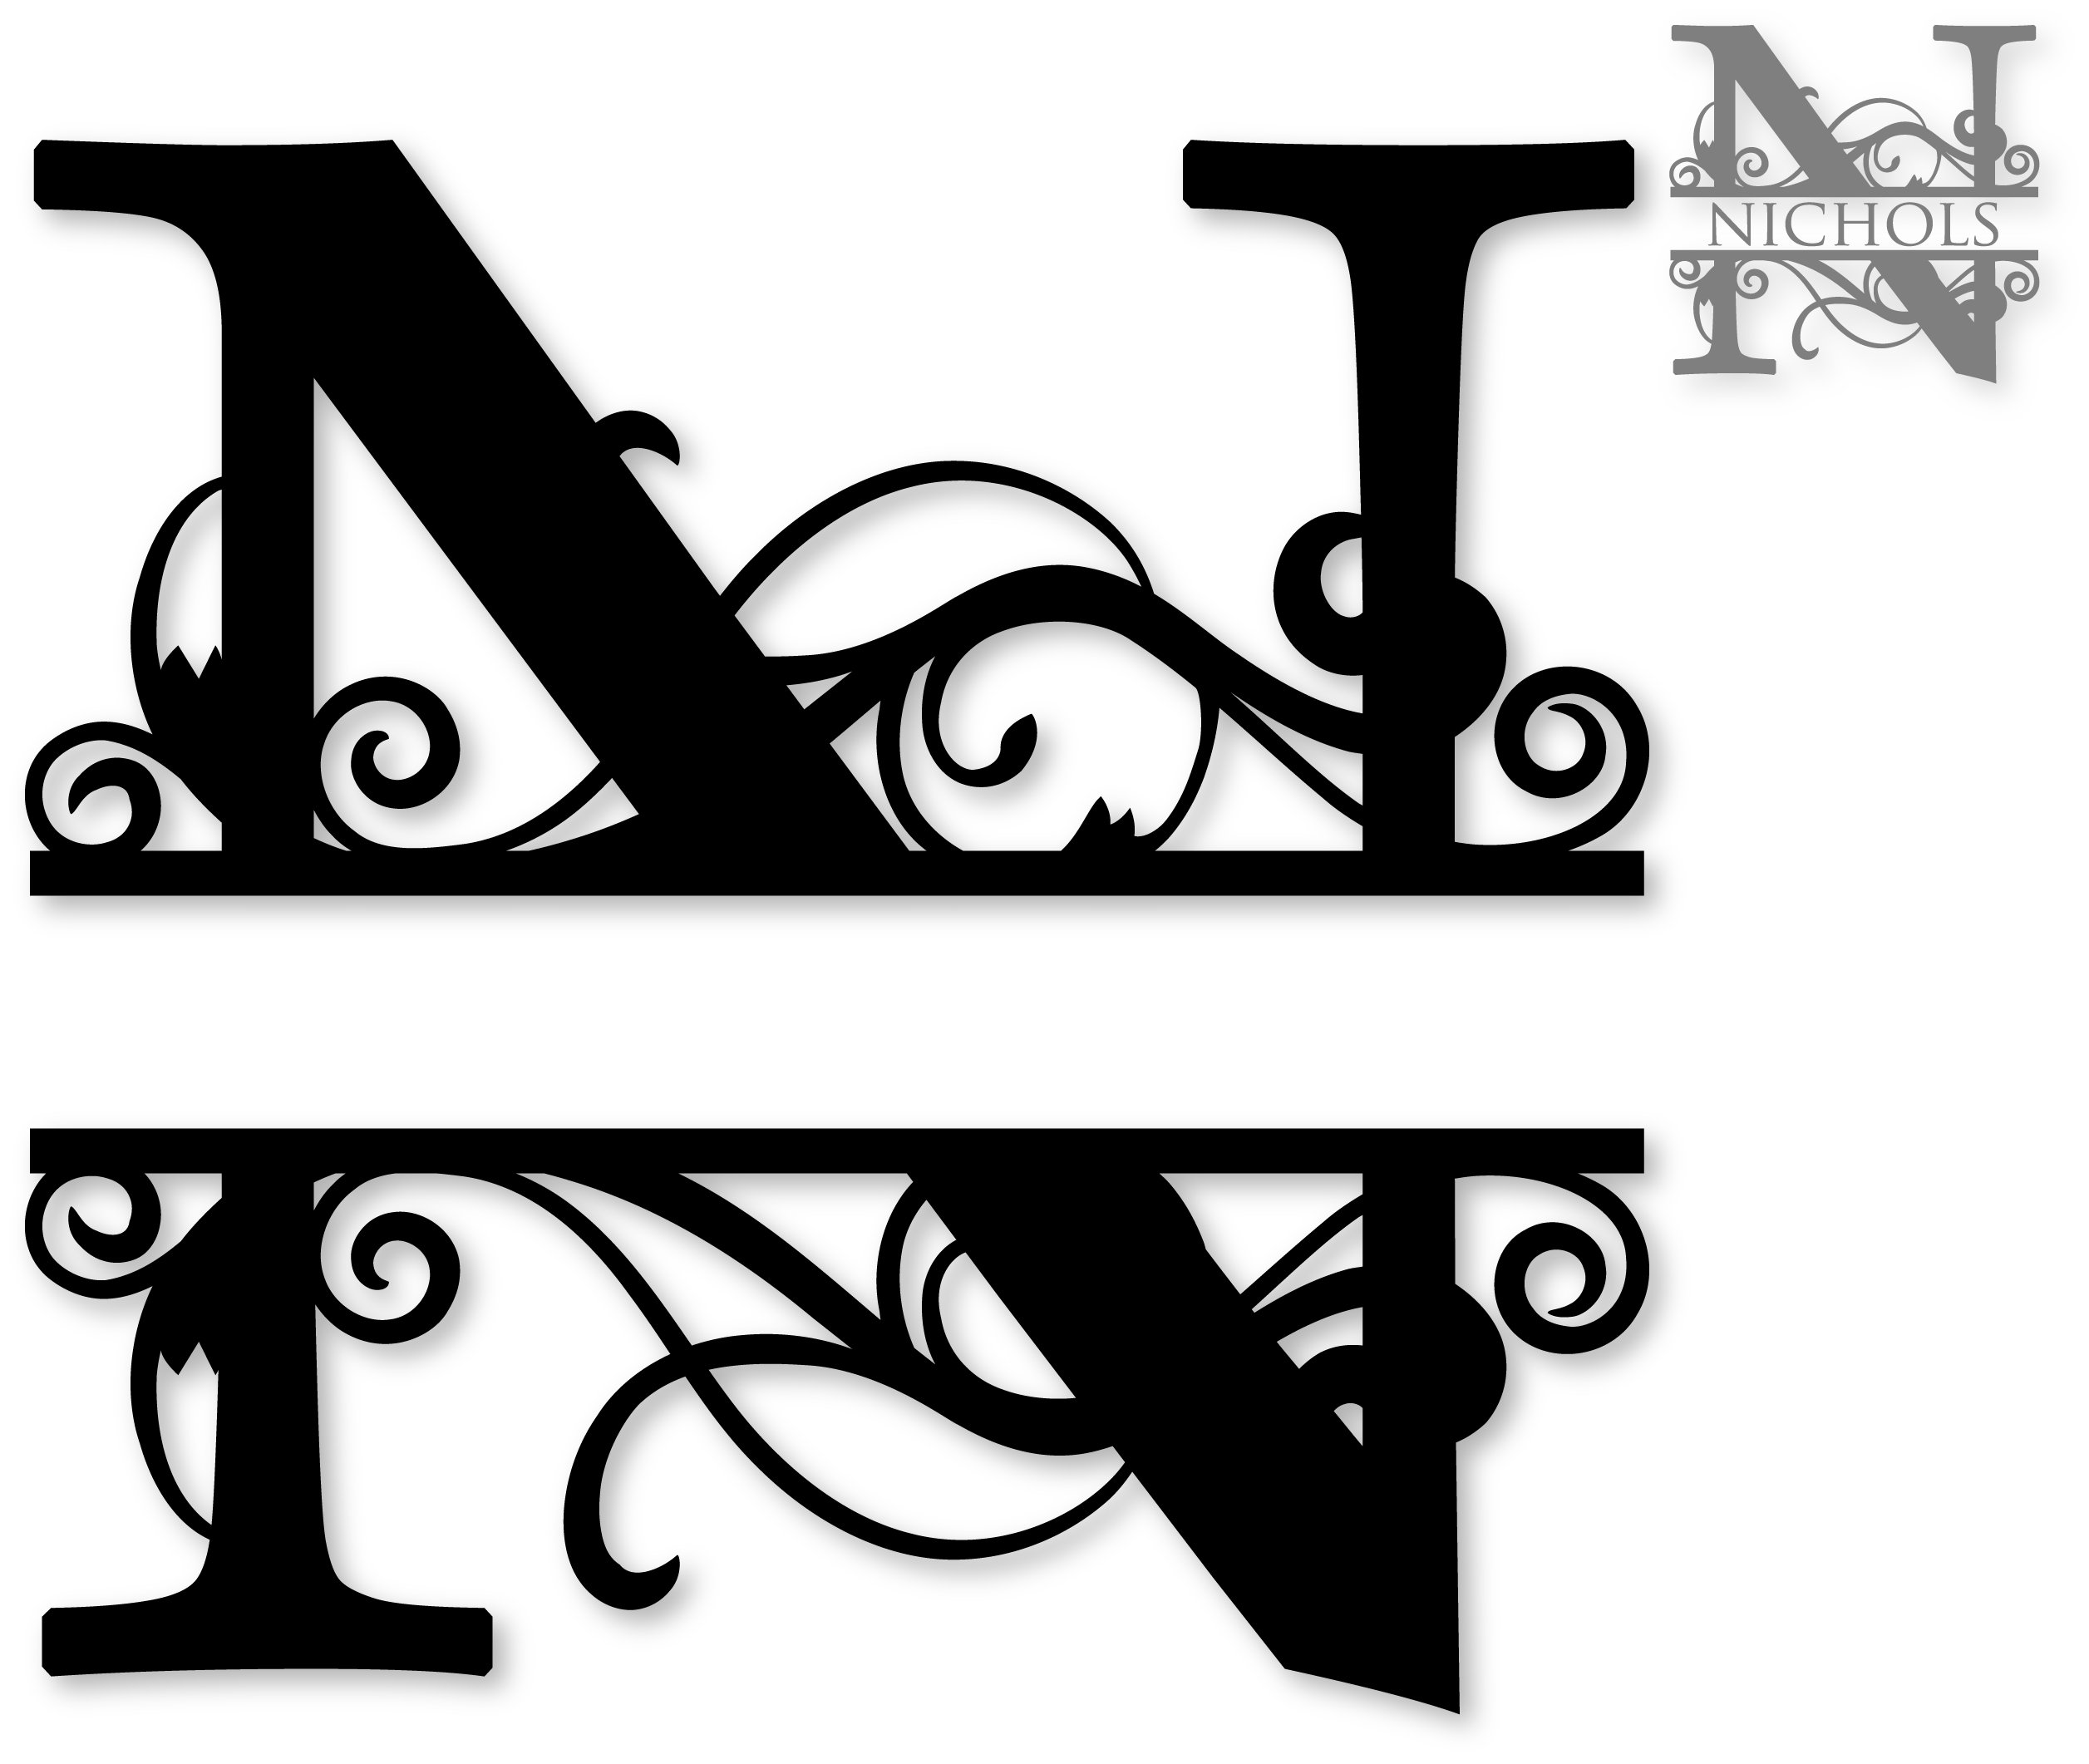 N split silhouette graphics. M clipart monogram